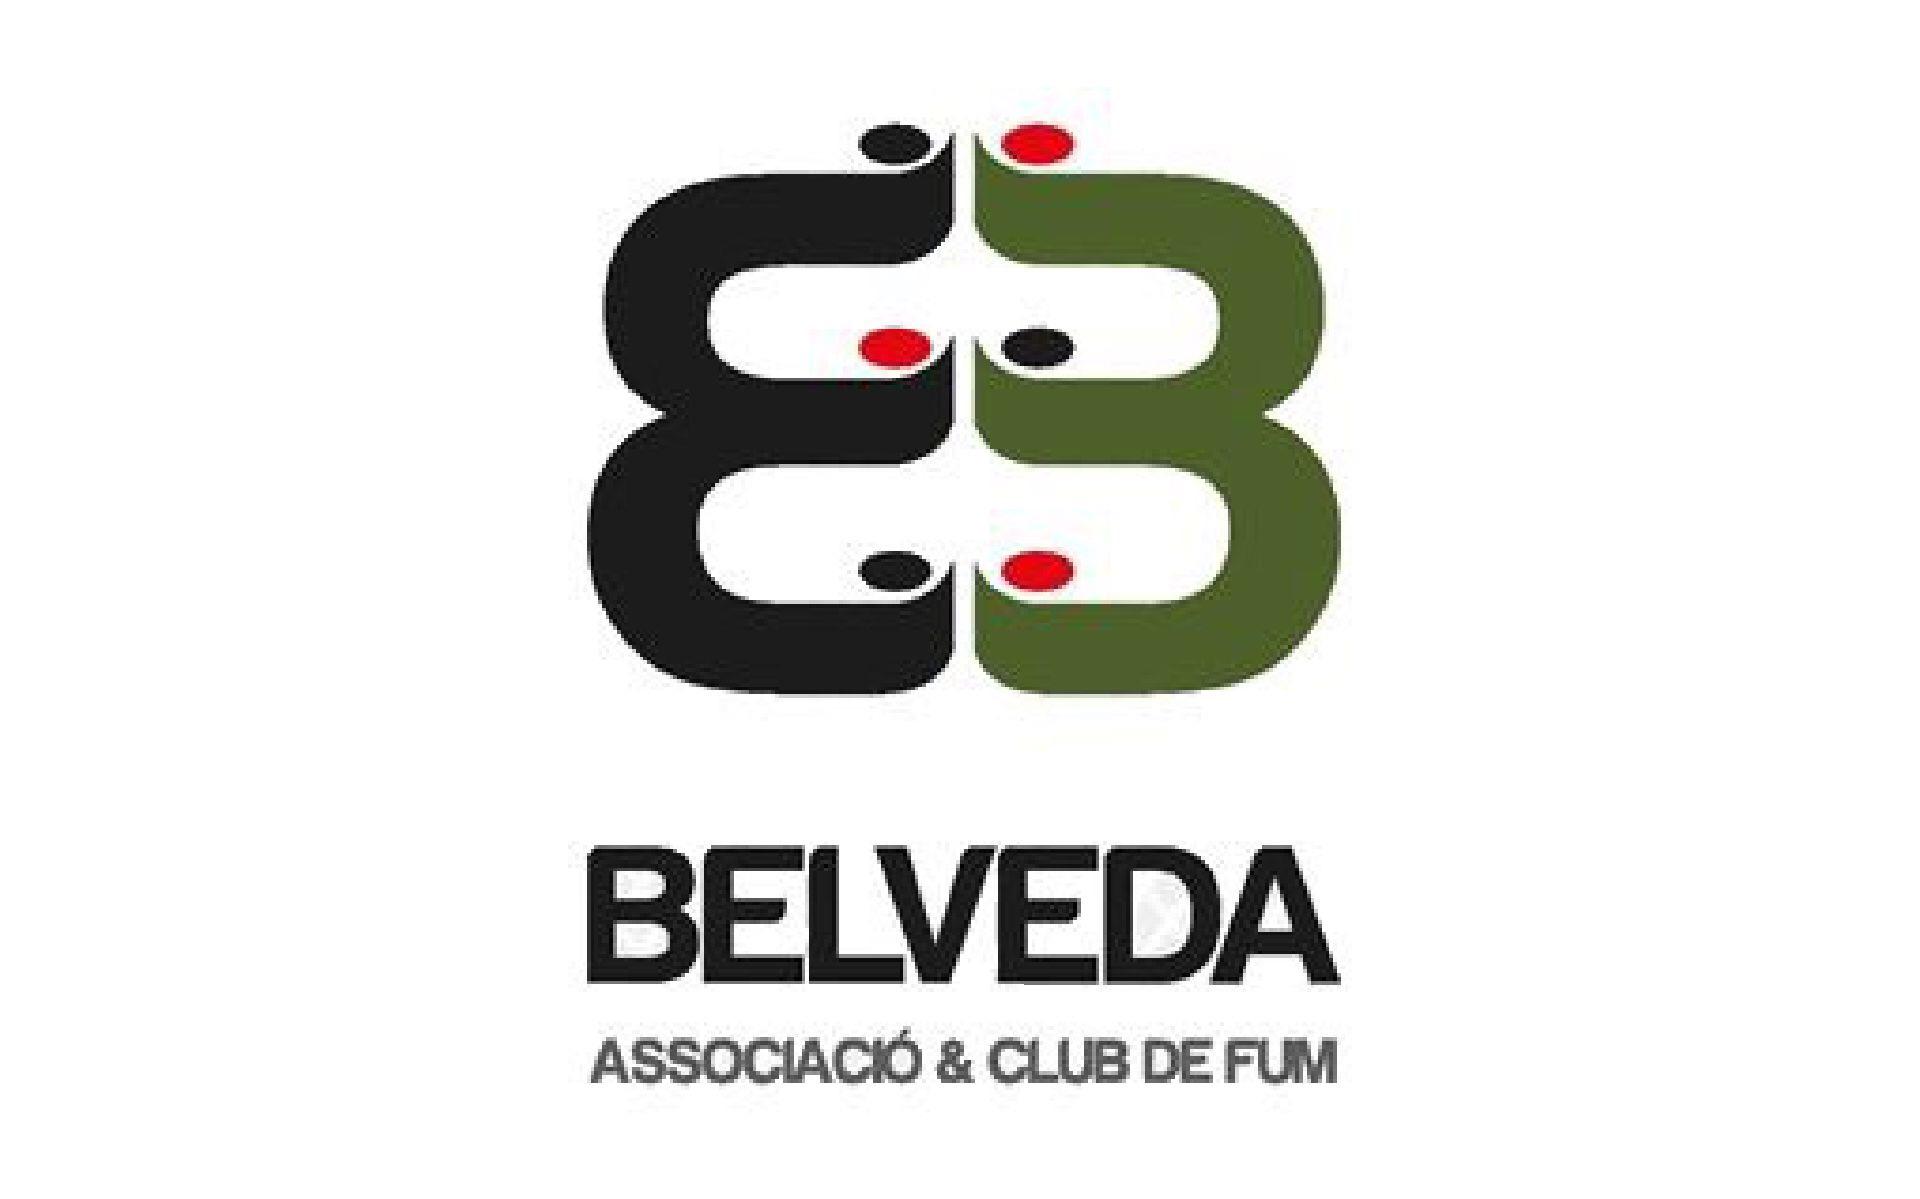 weed club belveda barcelona